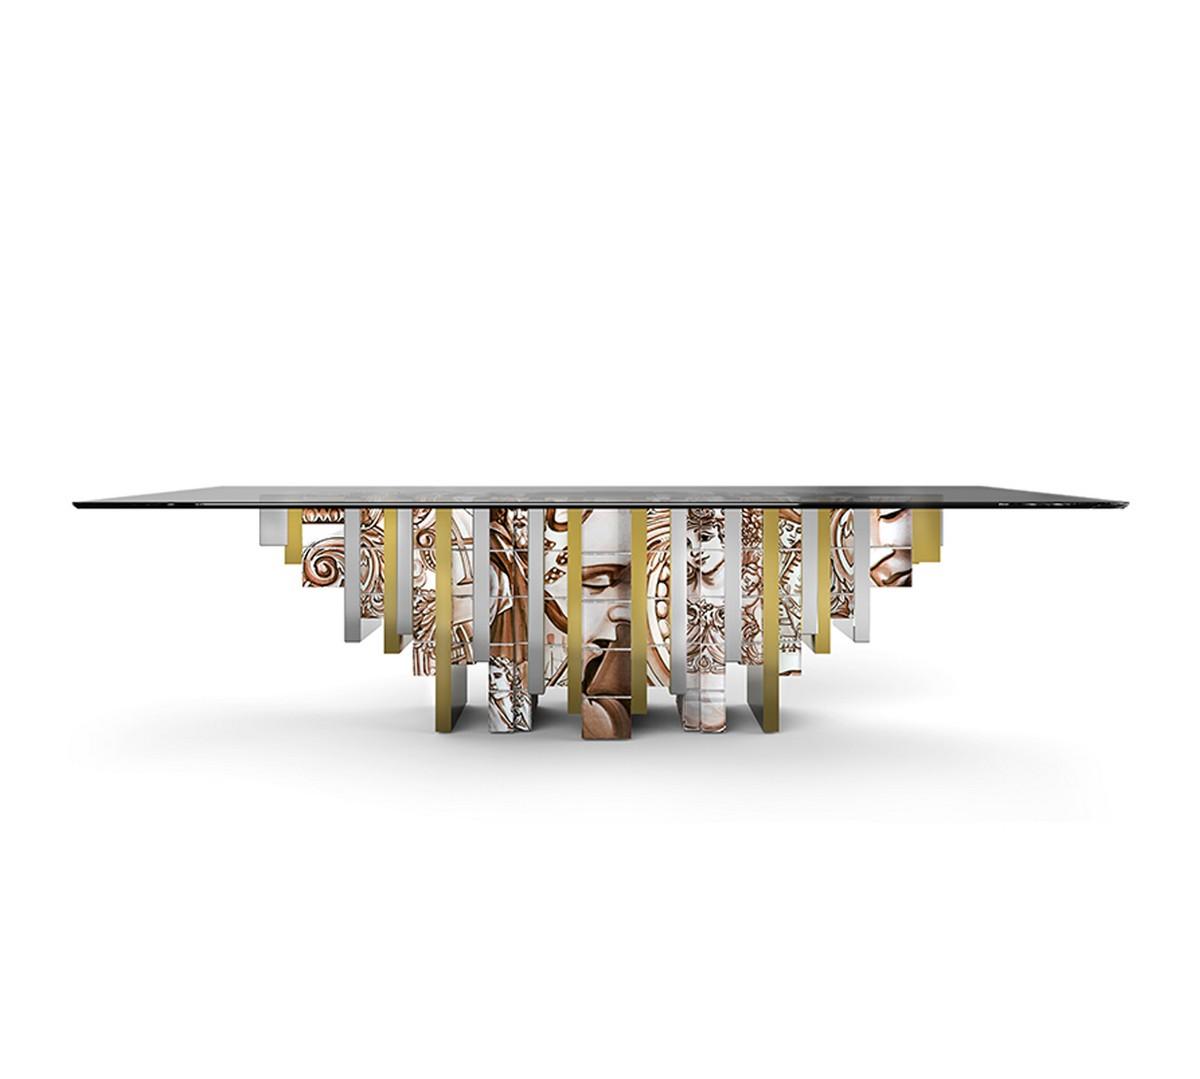 Top Bespoke Dining Tables bespoke dining tables Top Bespoke Dining Tables heritage2